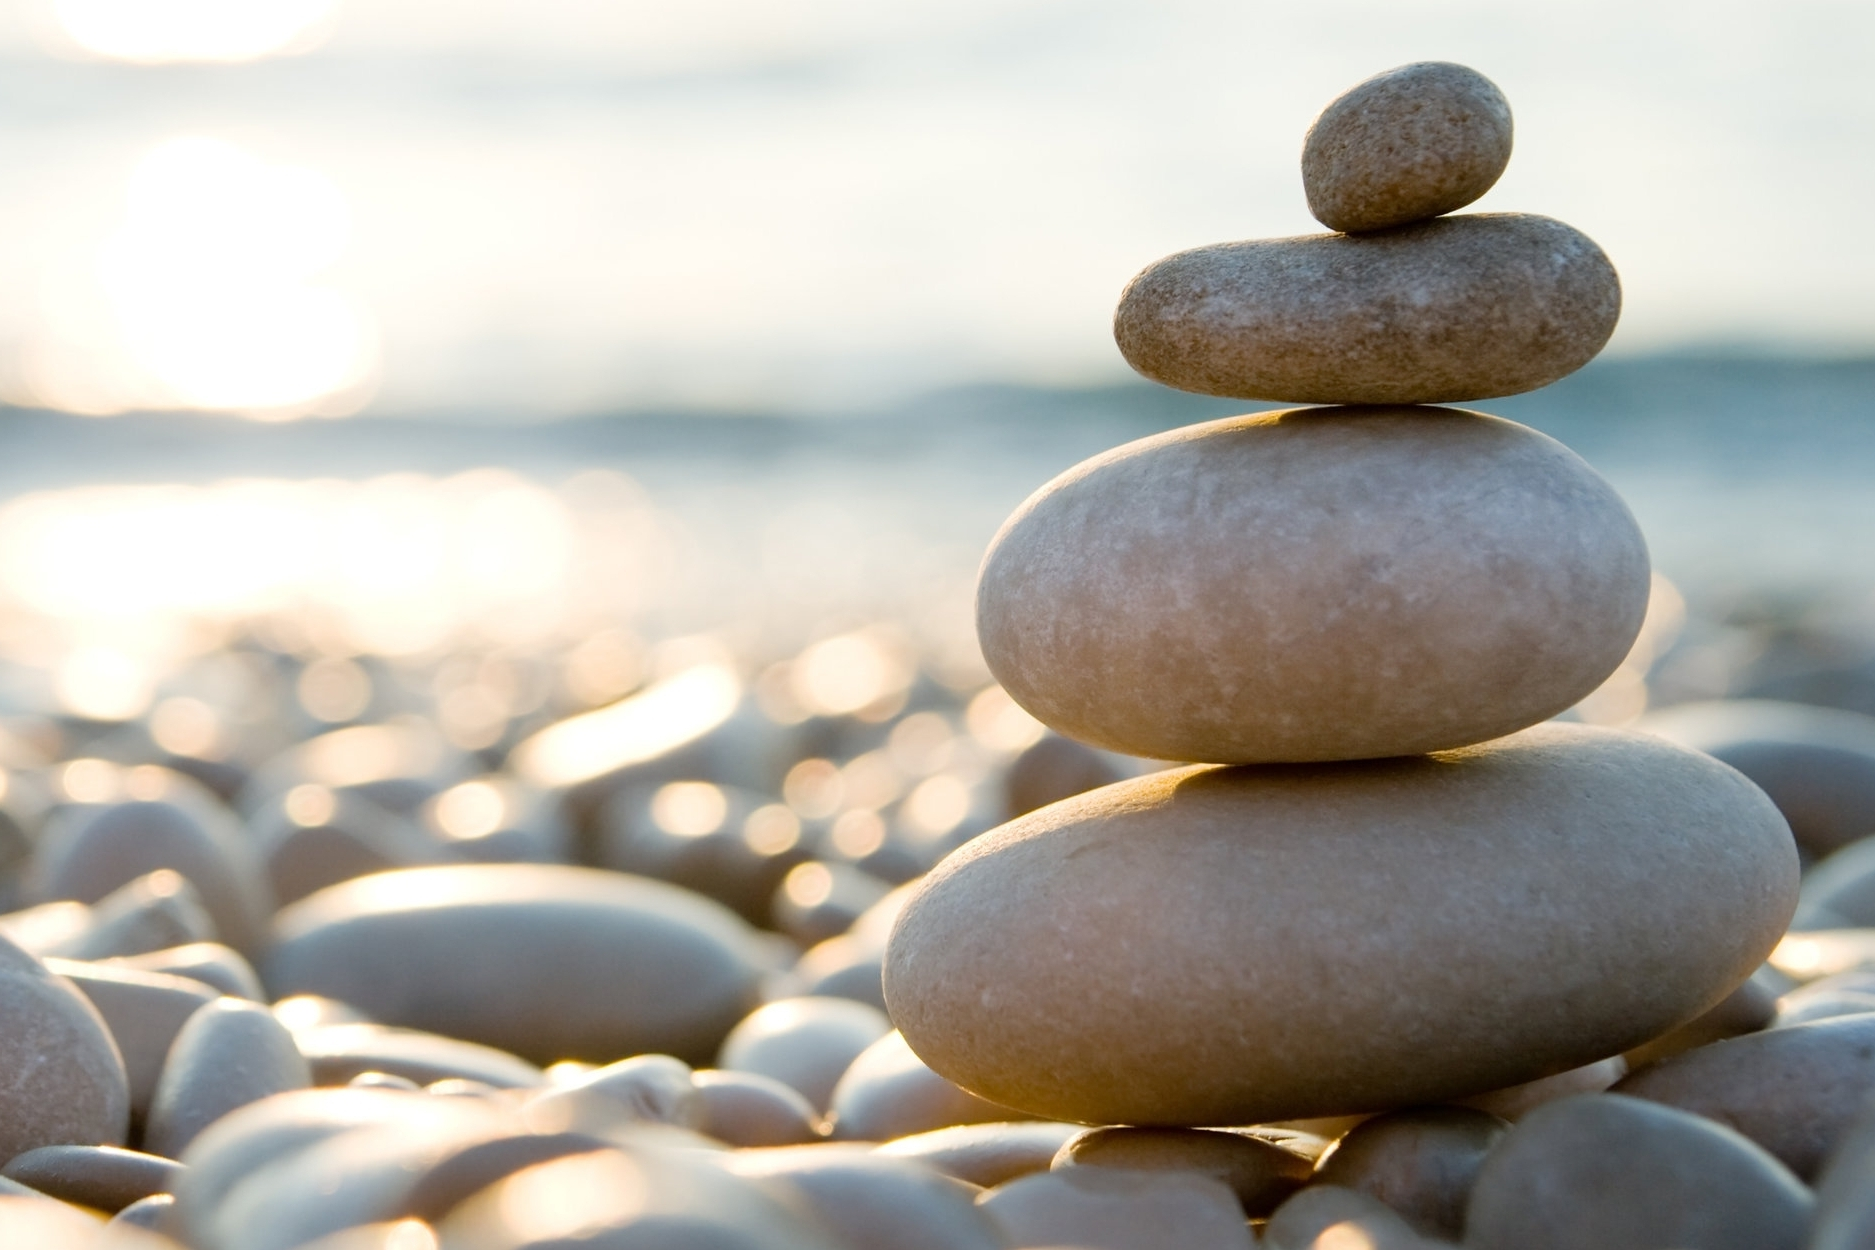 stones-stacked-157373207.jpg